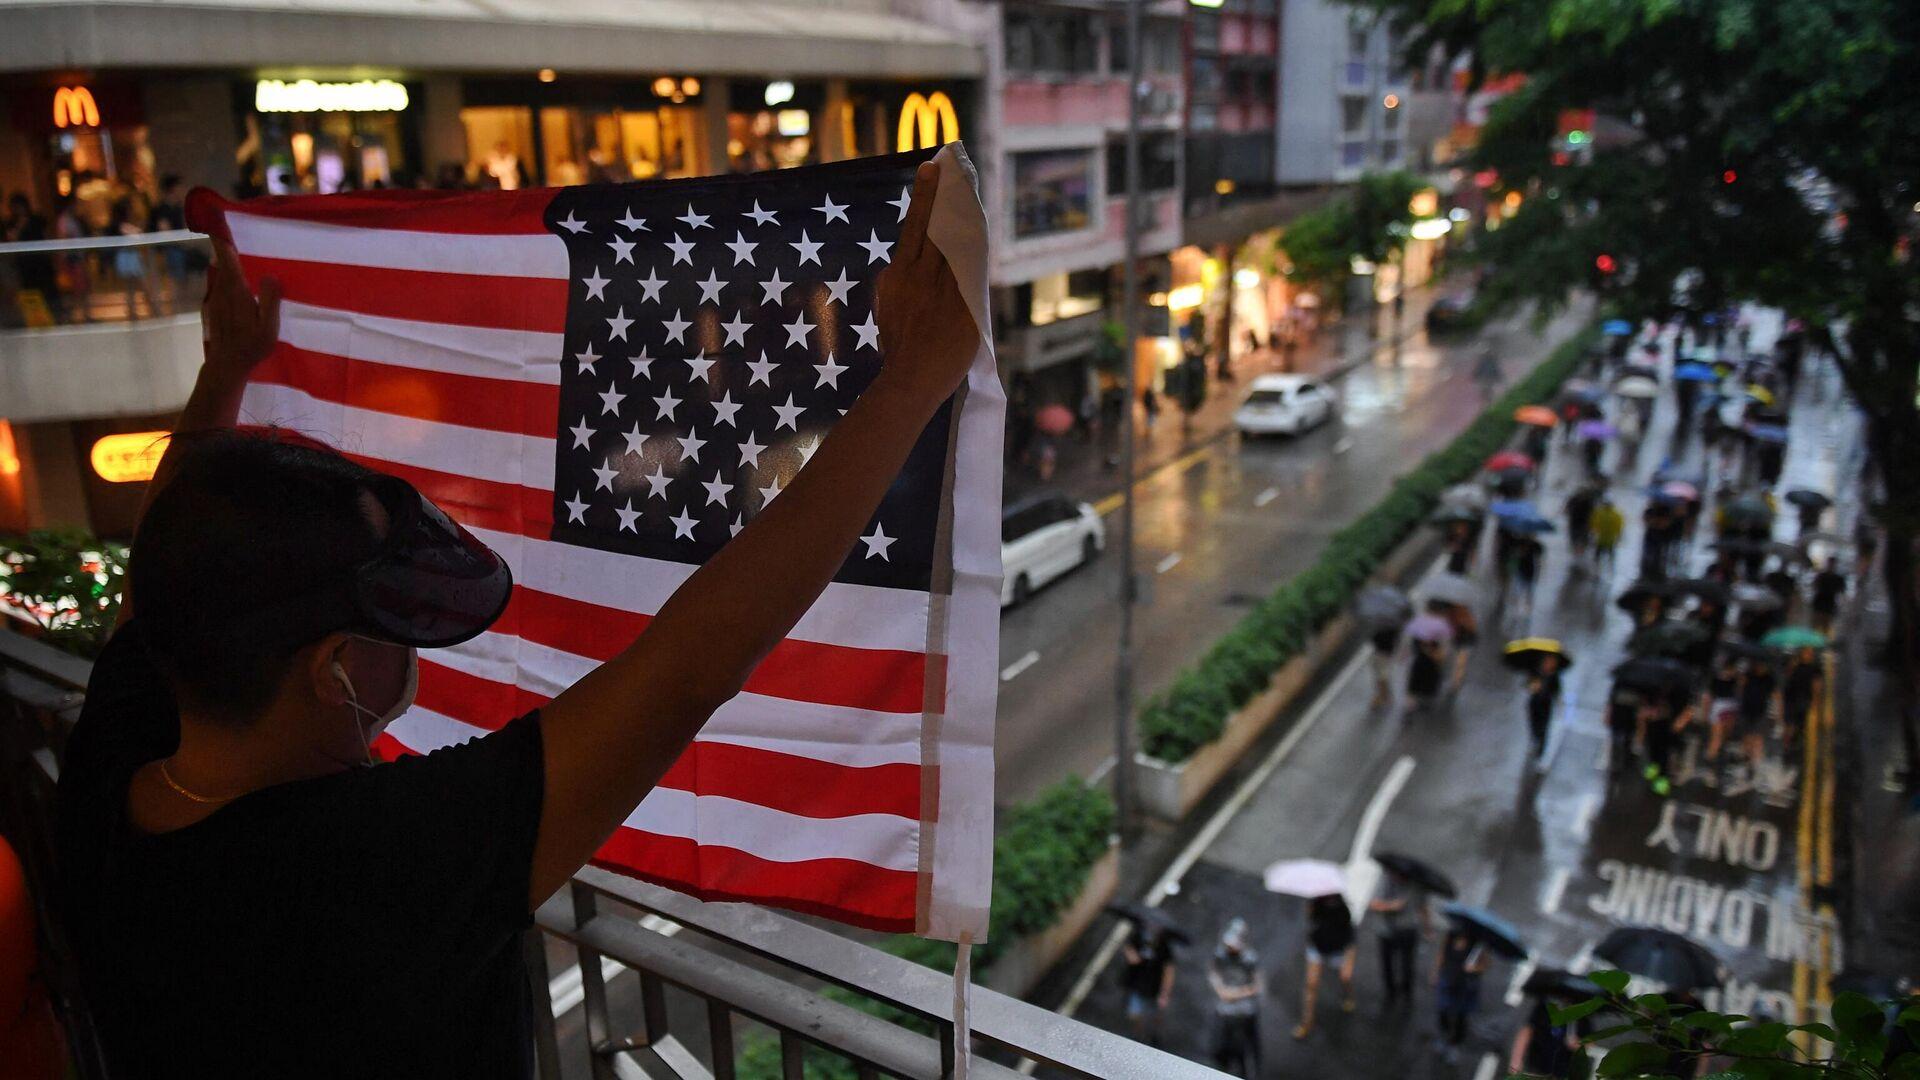 Человек с флагом США во время митинга в Гонконге - Sputnik Узбекистан, 1920, 22.09.2021